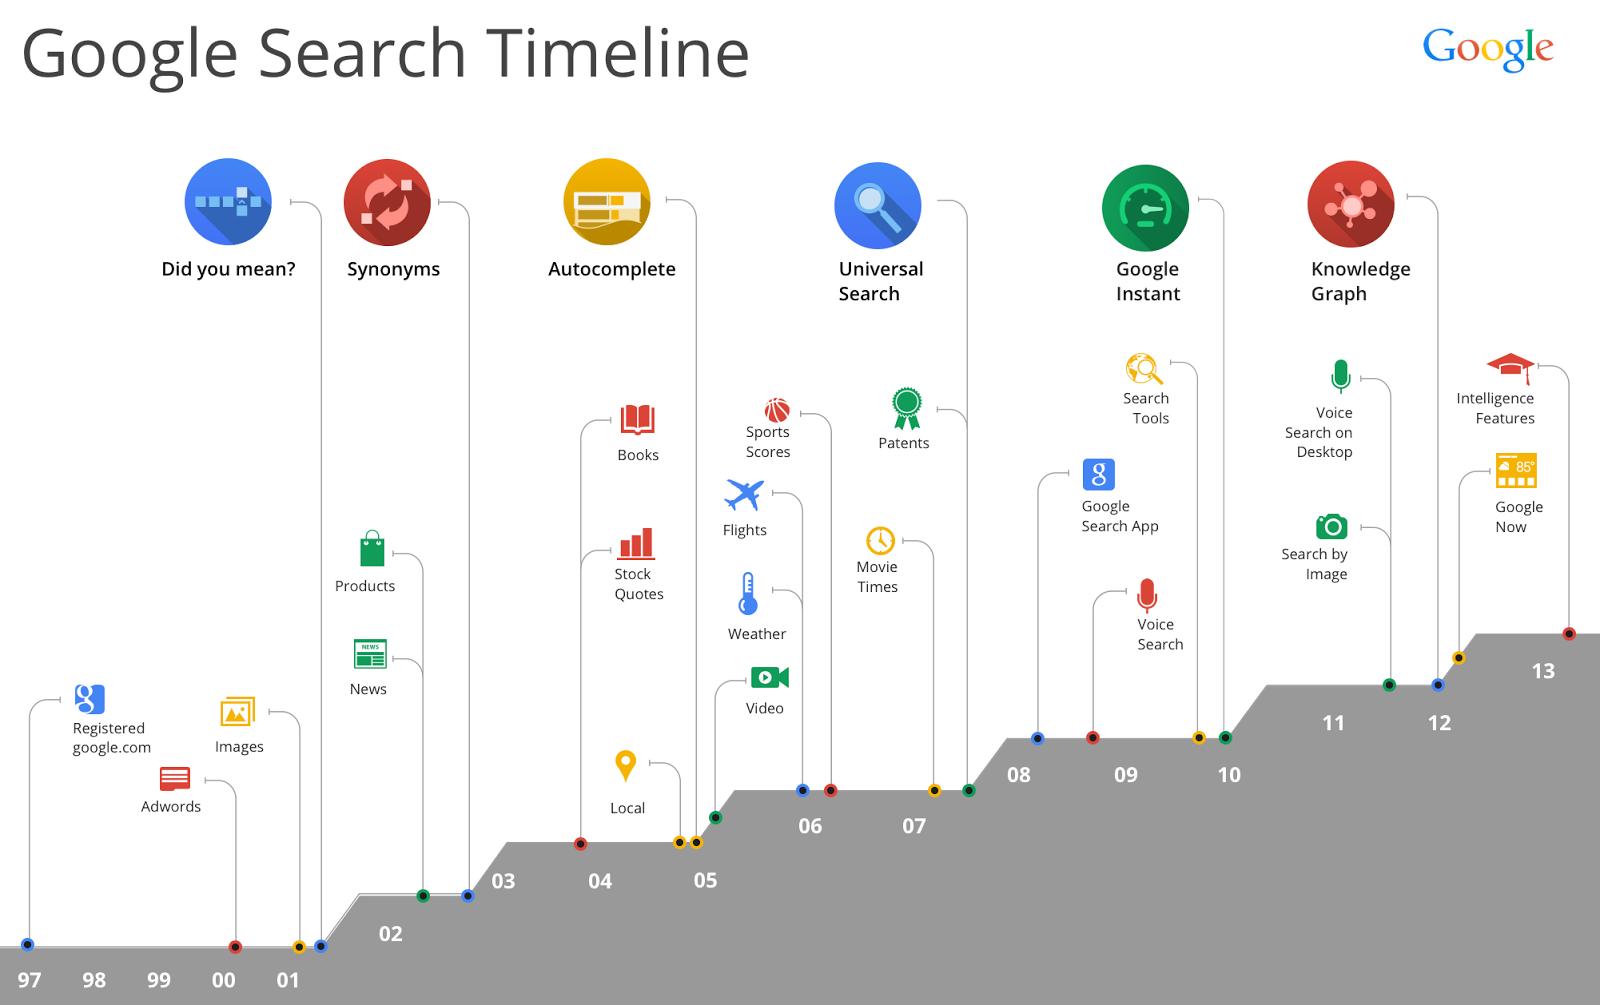 Google Search Timeline 1997 - 2013